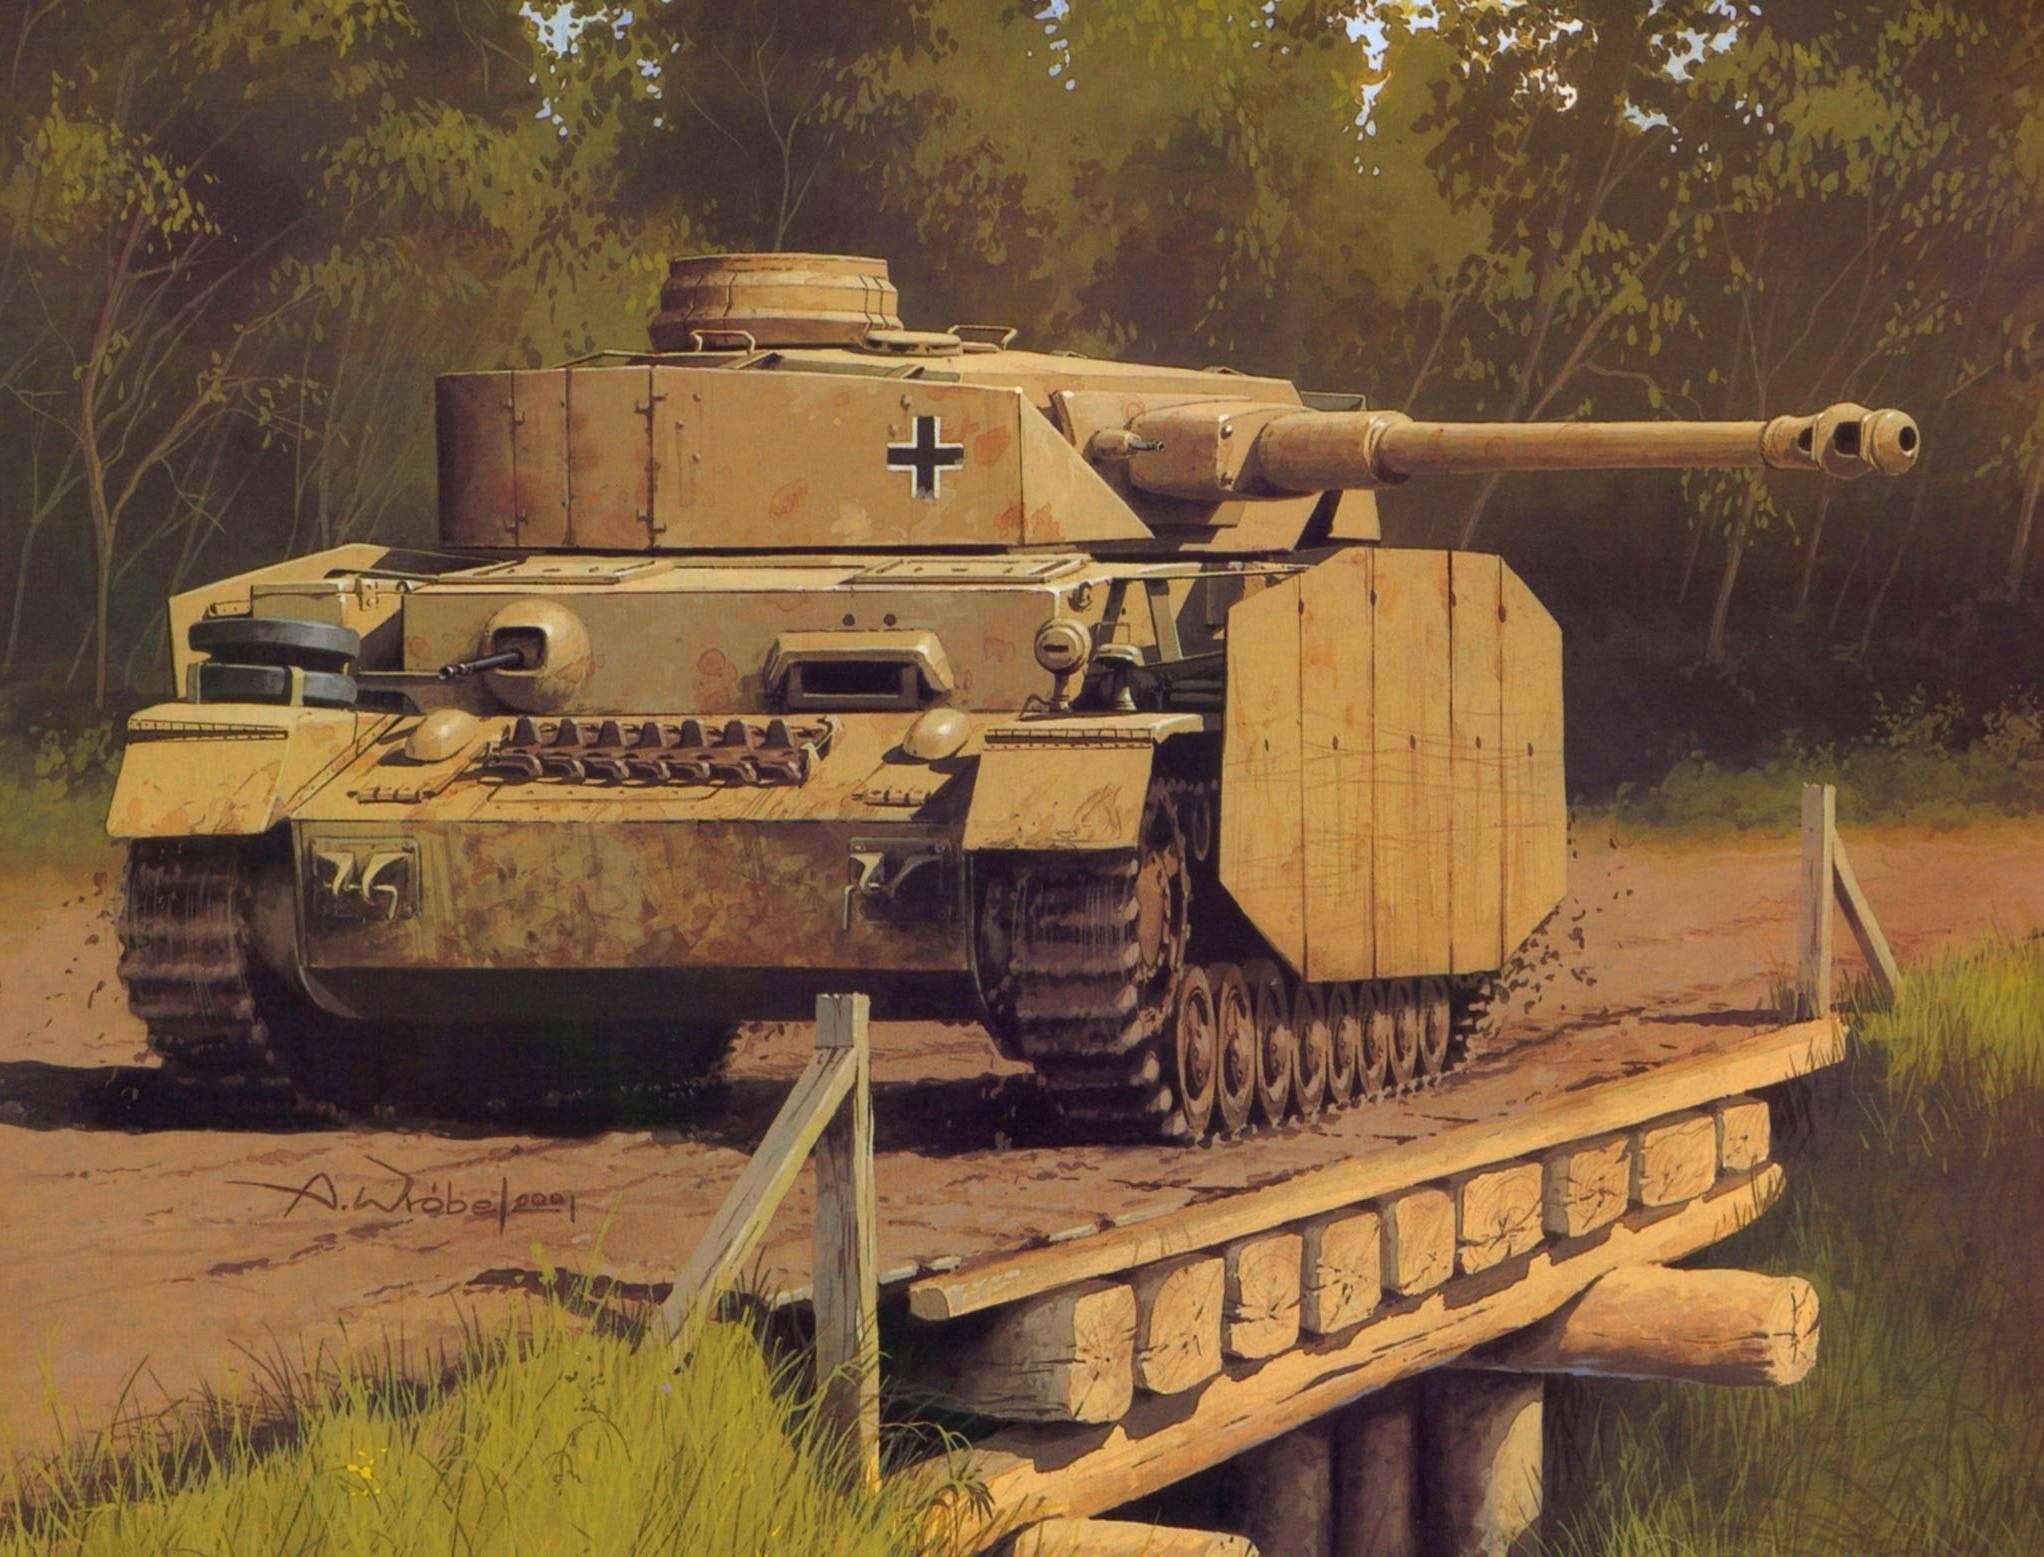 ww2 german army wallpaper - photo #36